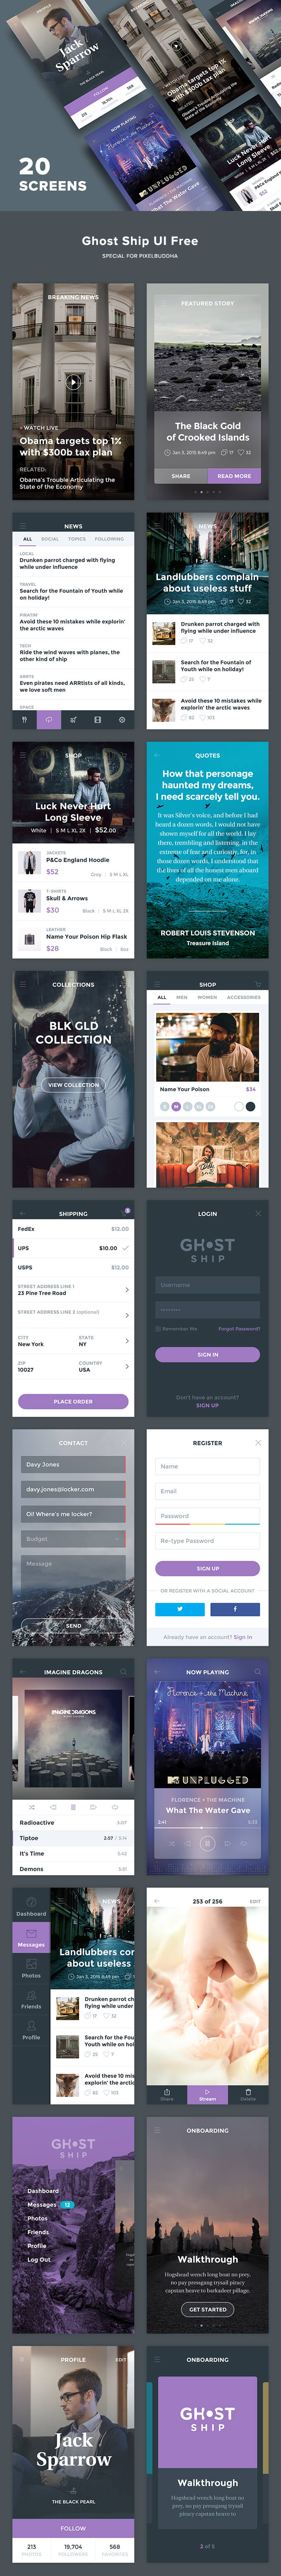 Ghost Ship Mobile UI Kit (.Psd) скачать бесплатно